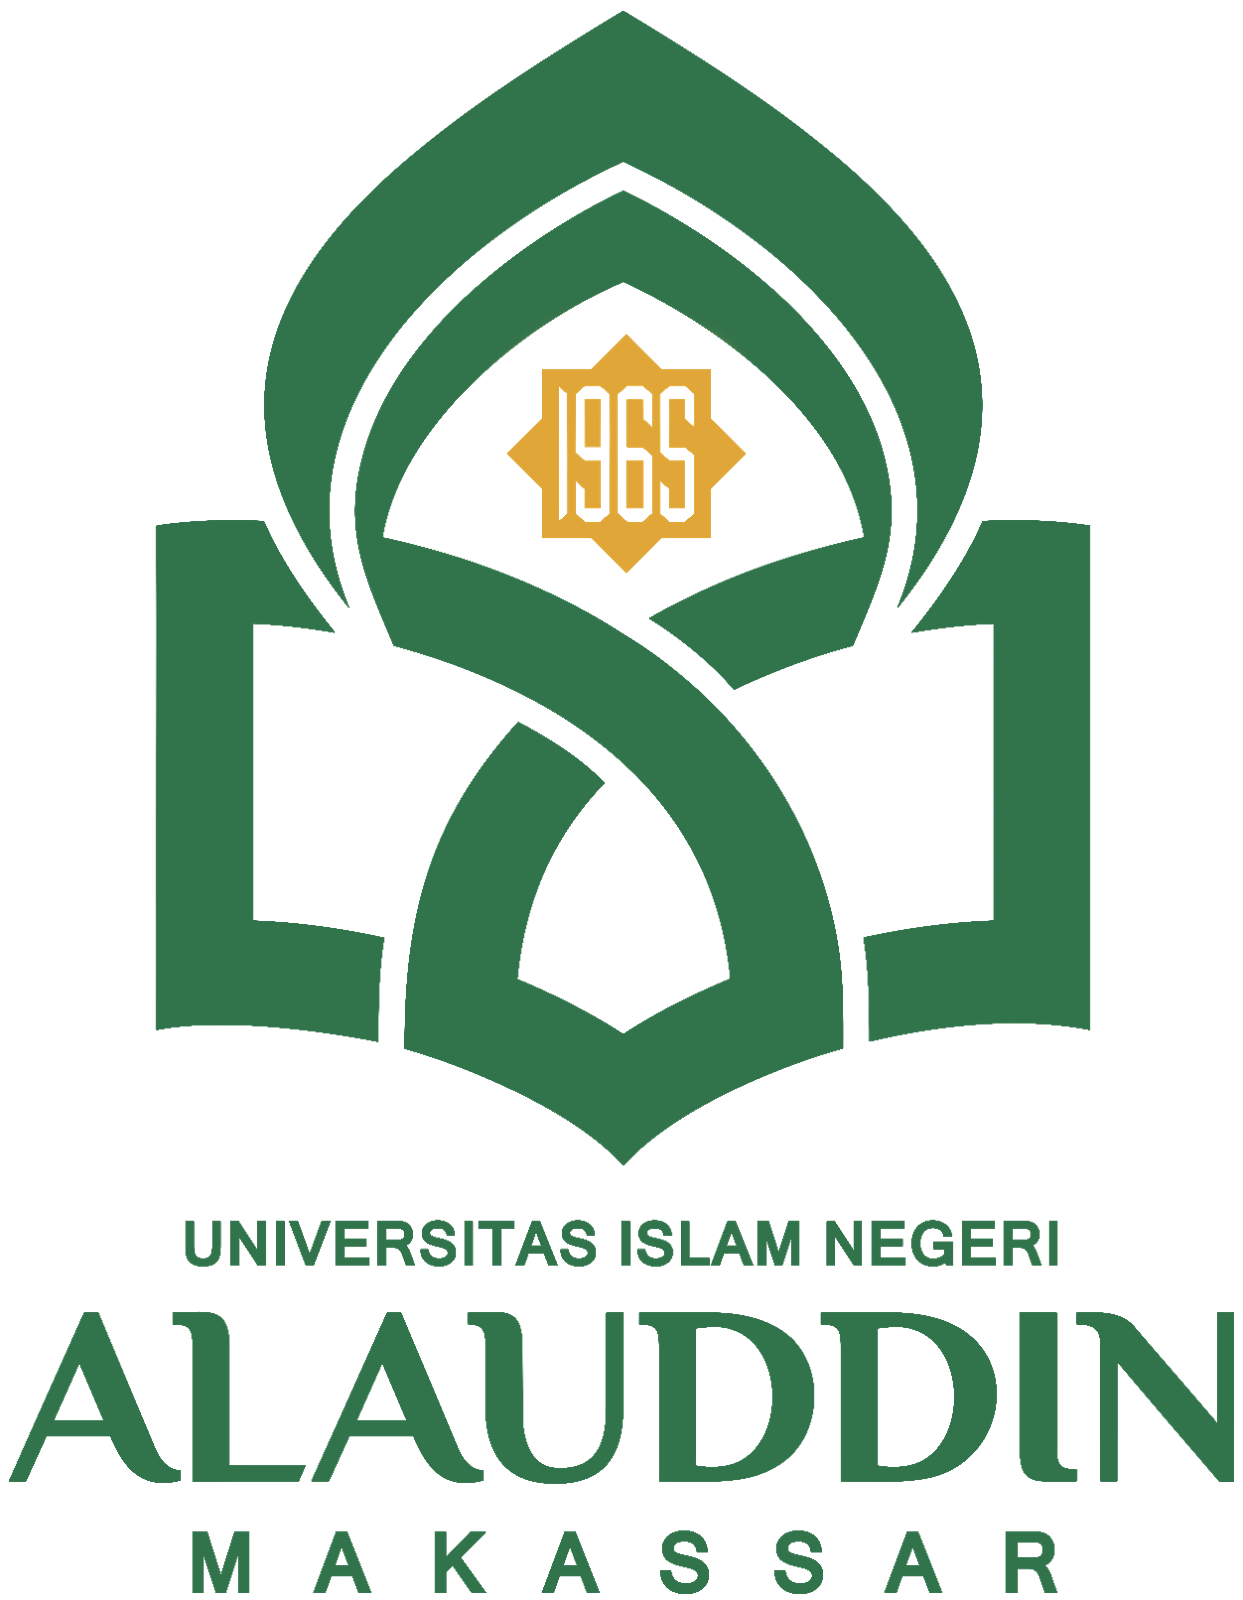 Fakultas Hukum UIN Alauddin Makassar